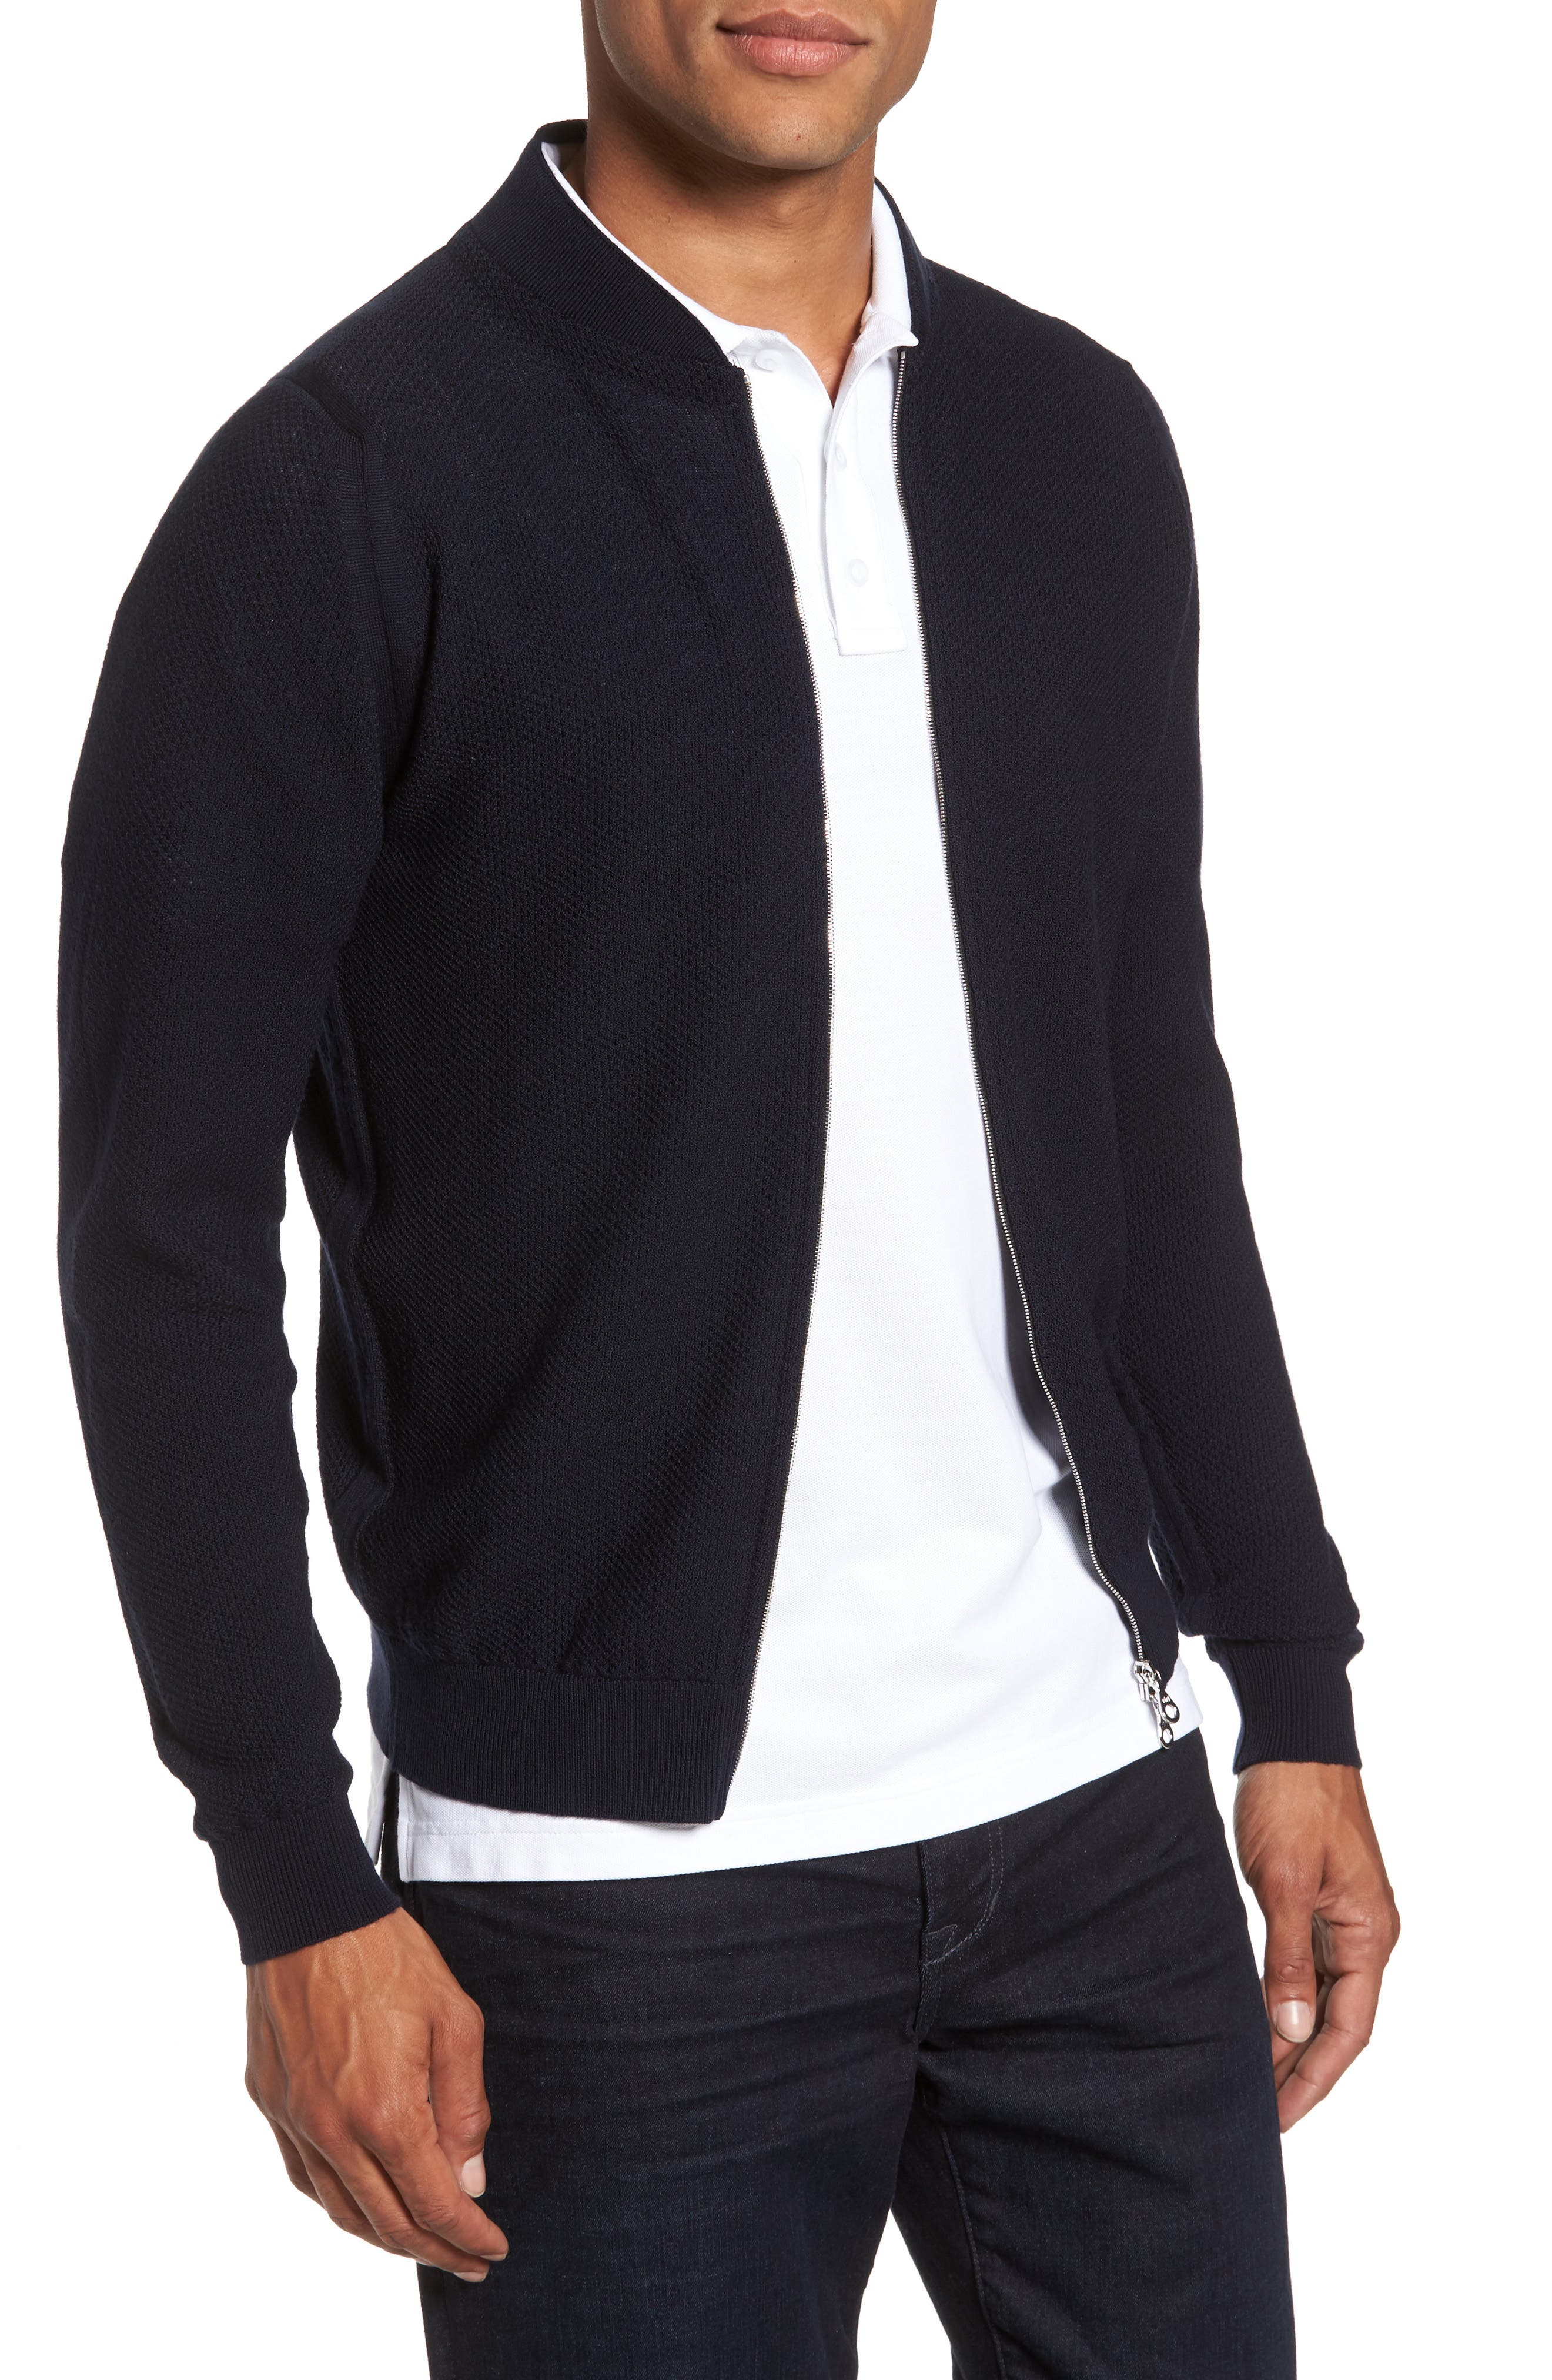 Alternate Image 1 Selected - John Smedley Standard Fit Merino Wool Knit Jacket